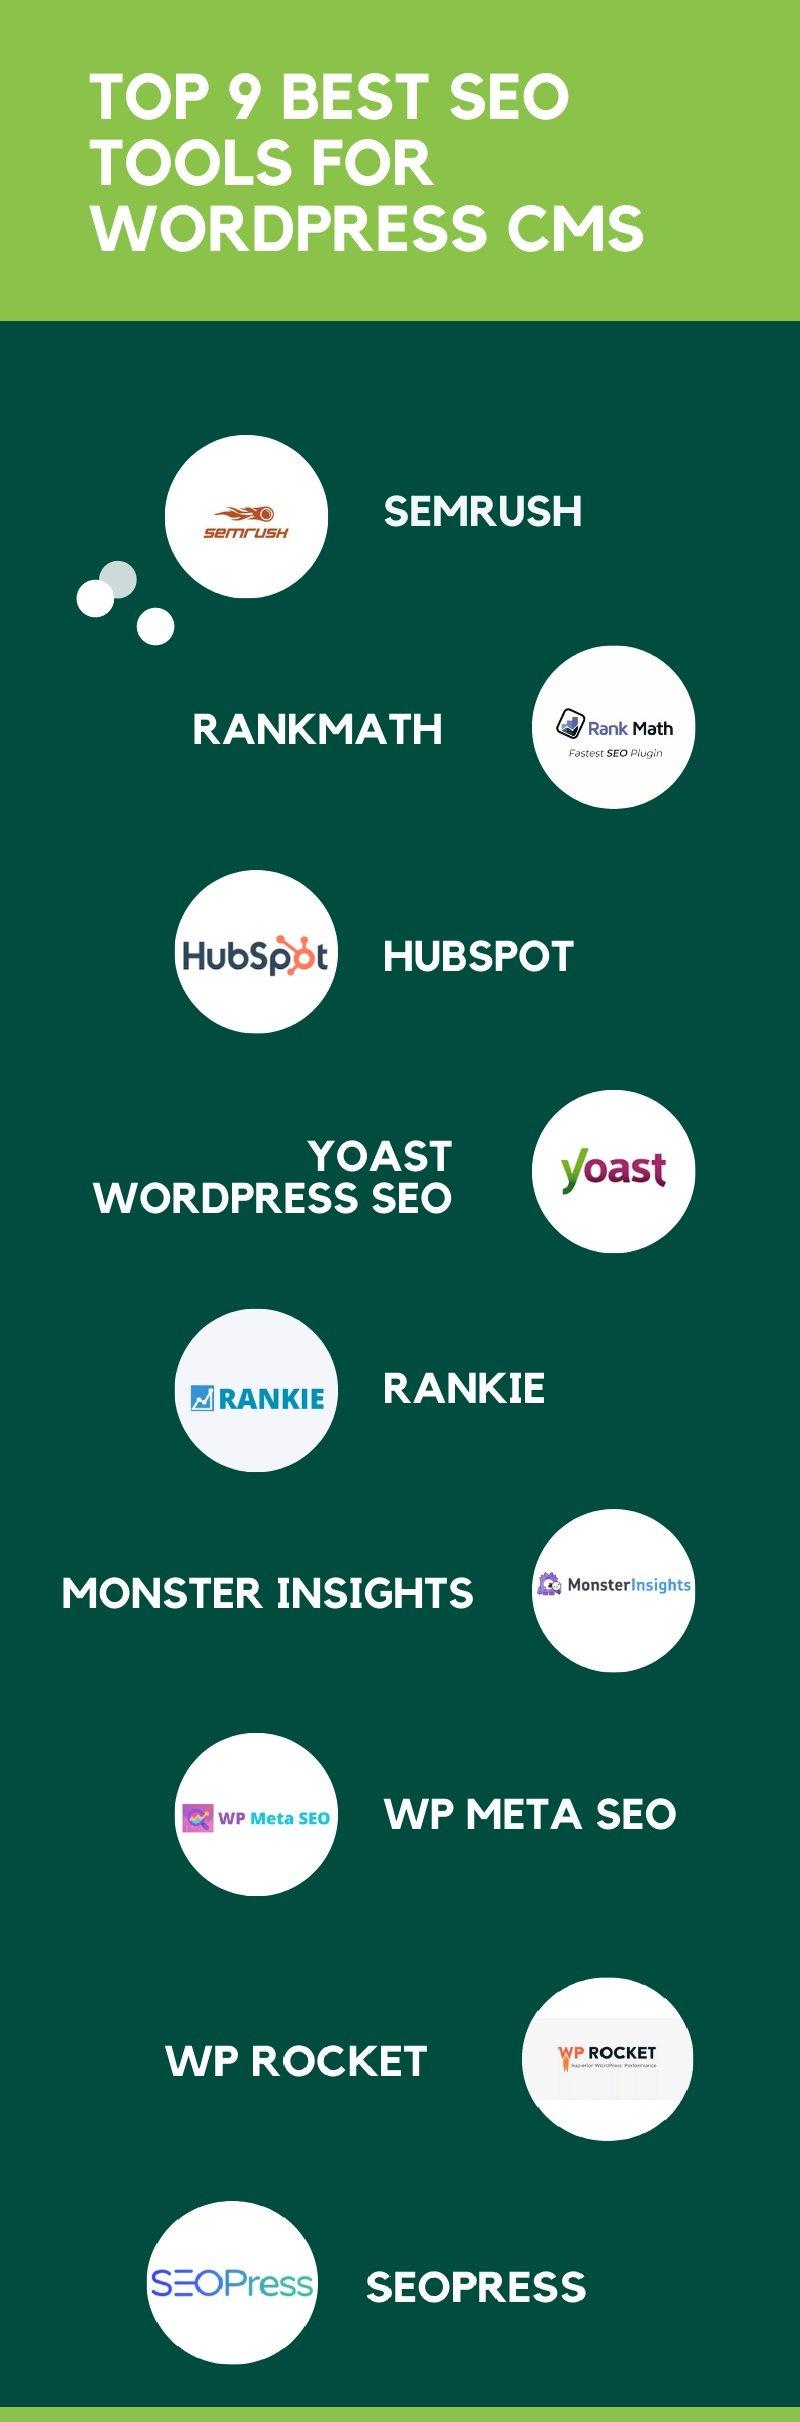 best seo tools for wordpress cms